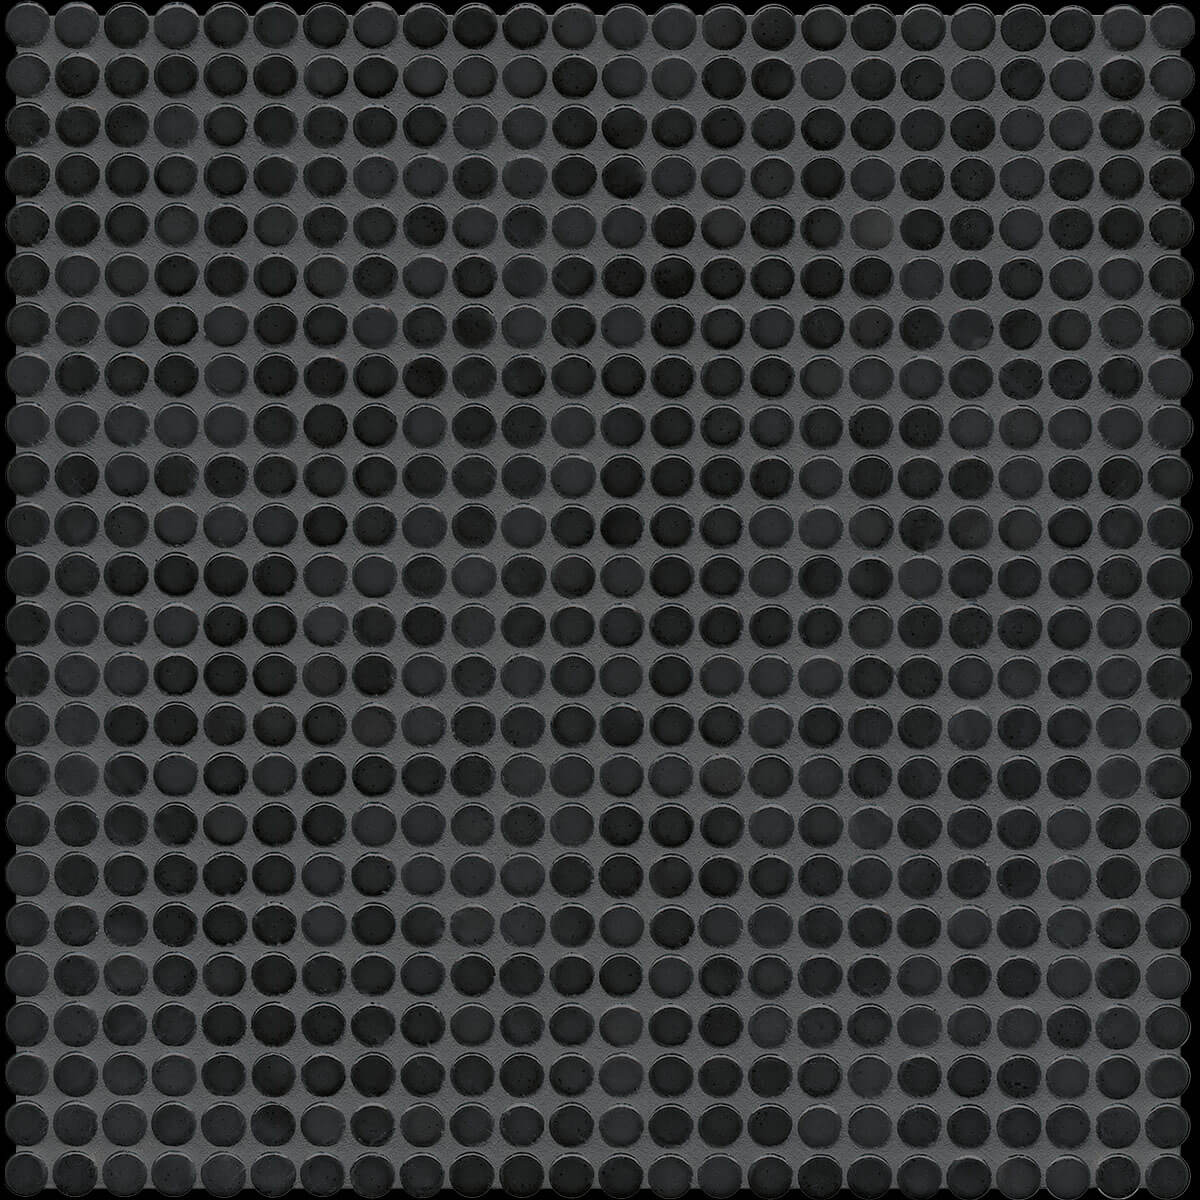 Agrob Buchtal Tiles - KLAY_Loop-_0013_40001H